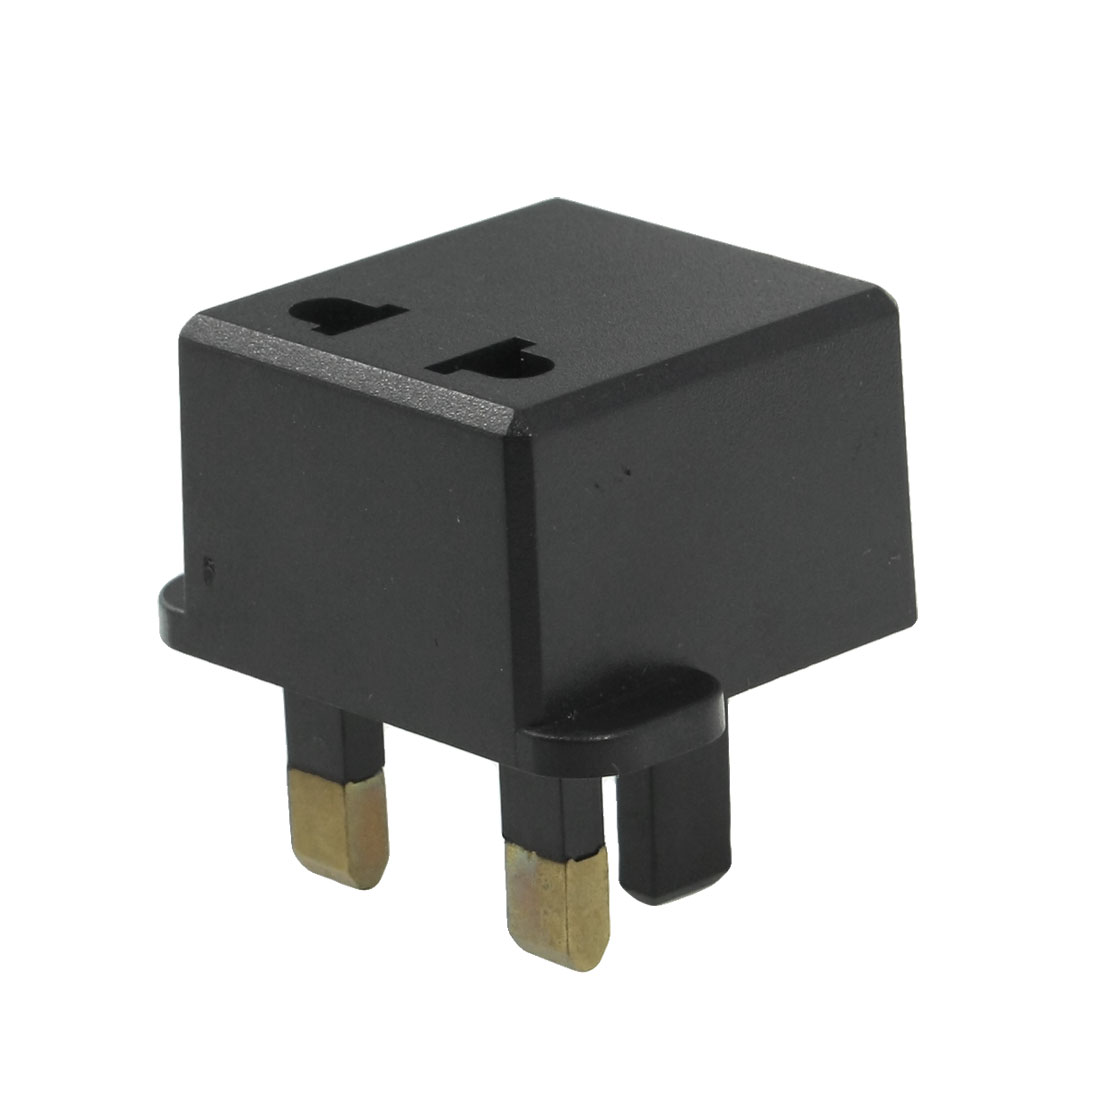 UK Type to 2 Pin US/EU Socket Travel Power Plug Adapter 125V/250V 6A